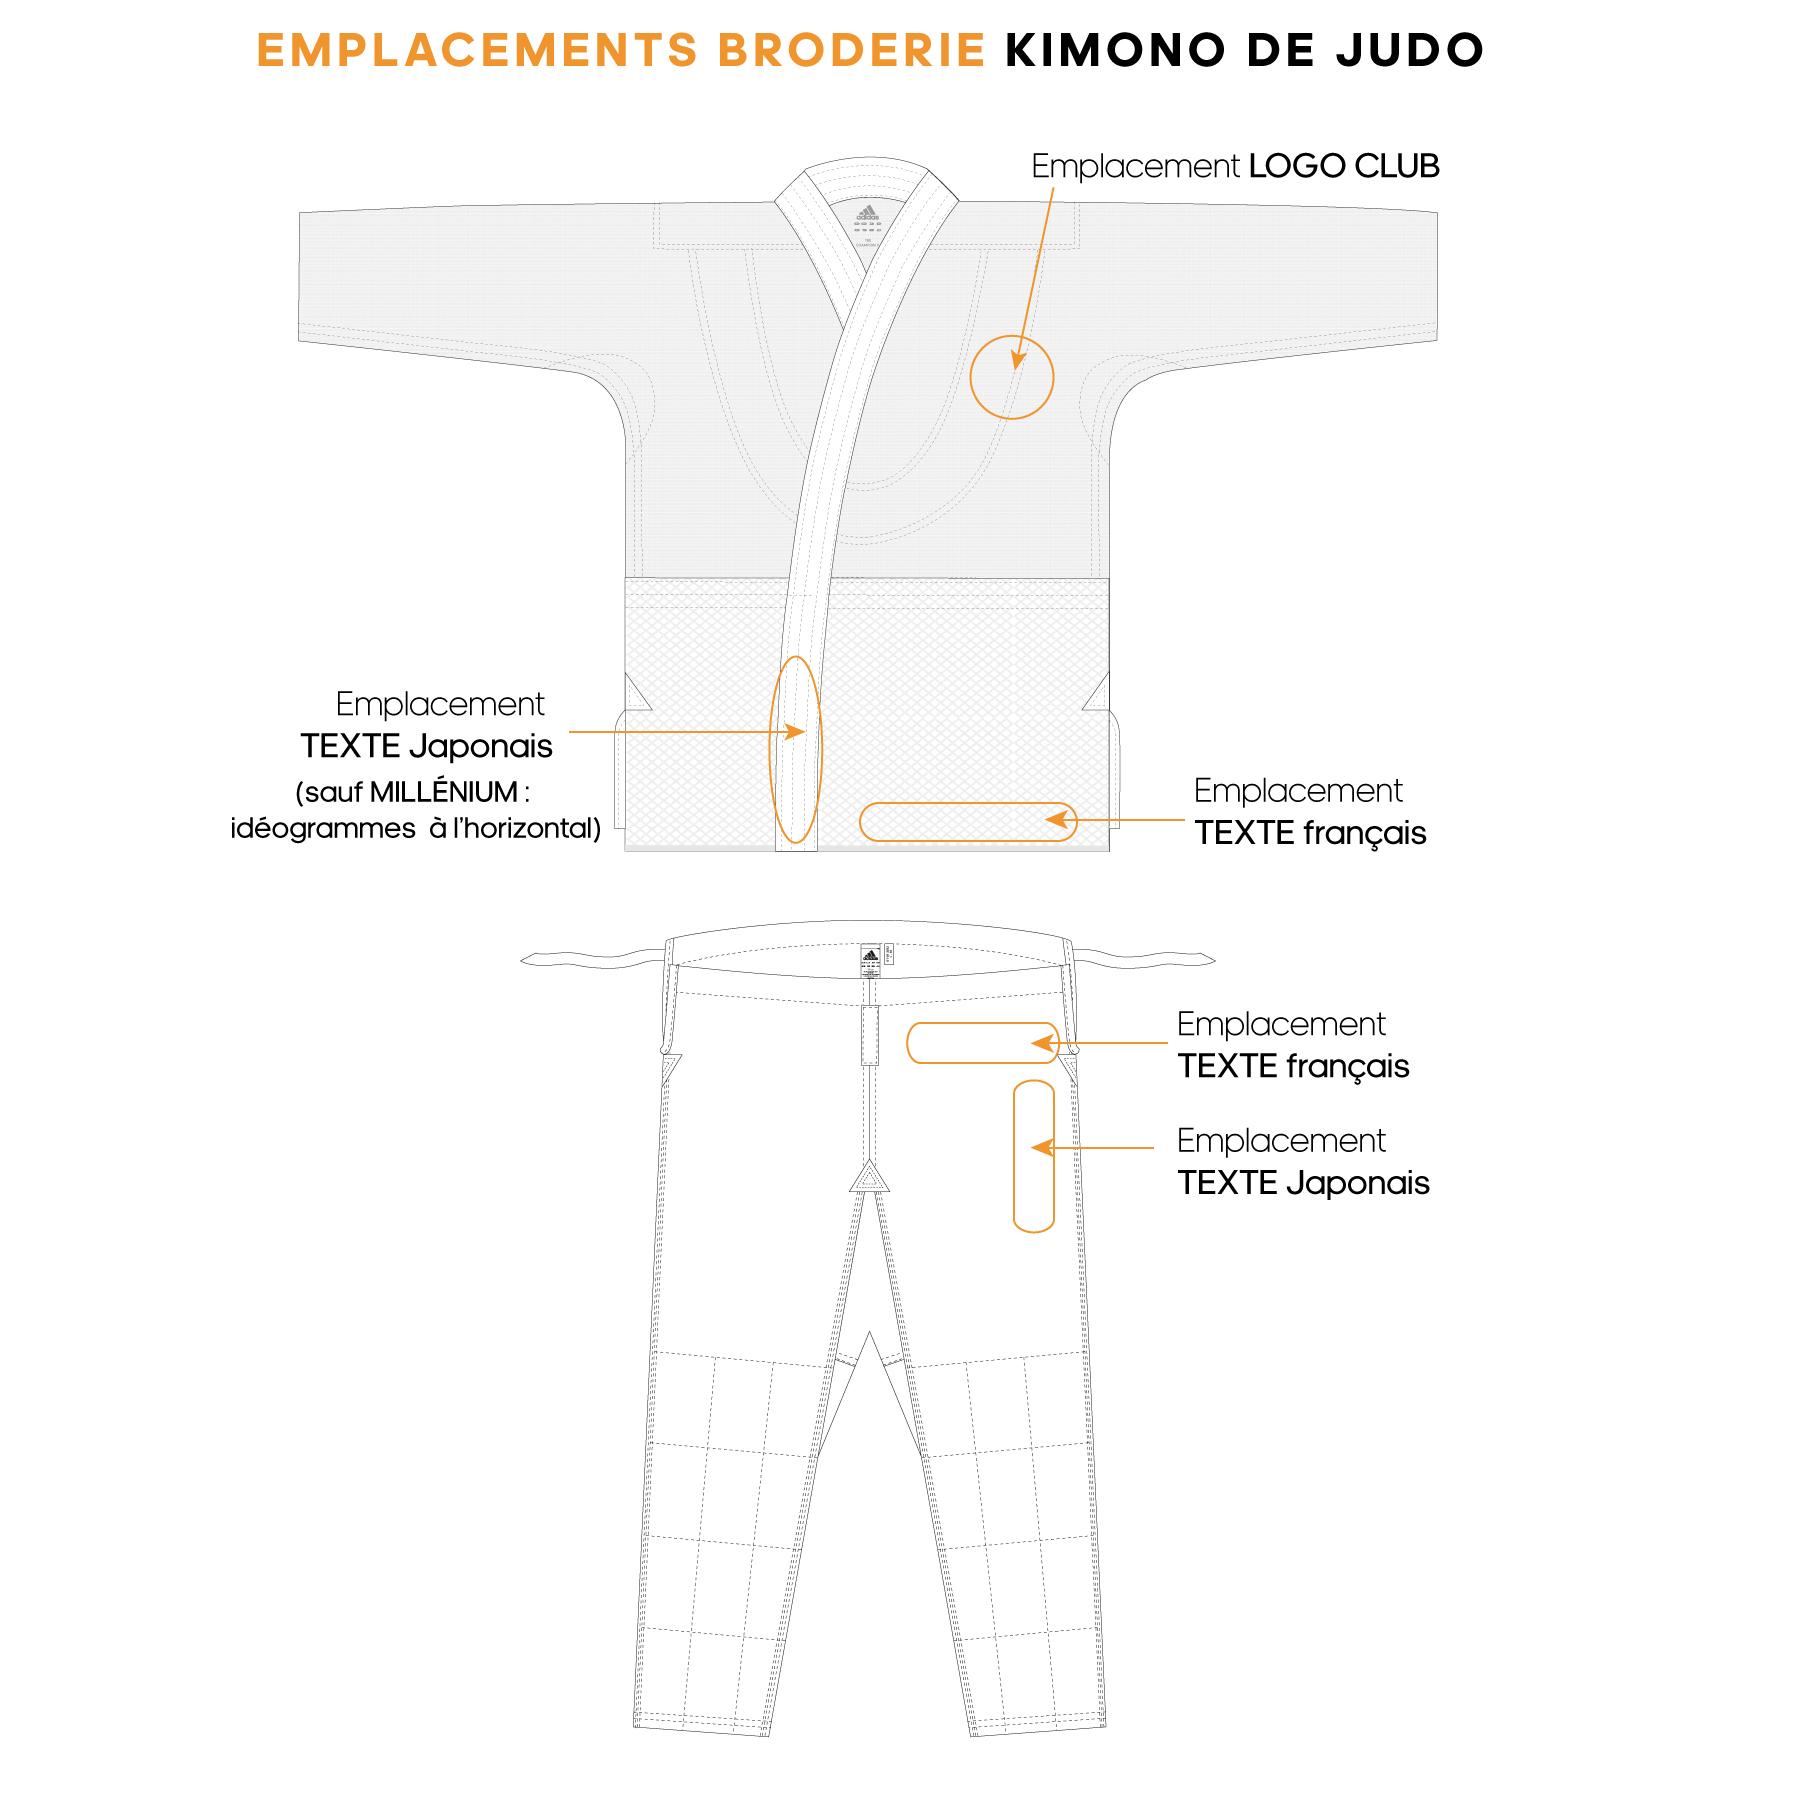 Broderie de kimono de judo